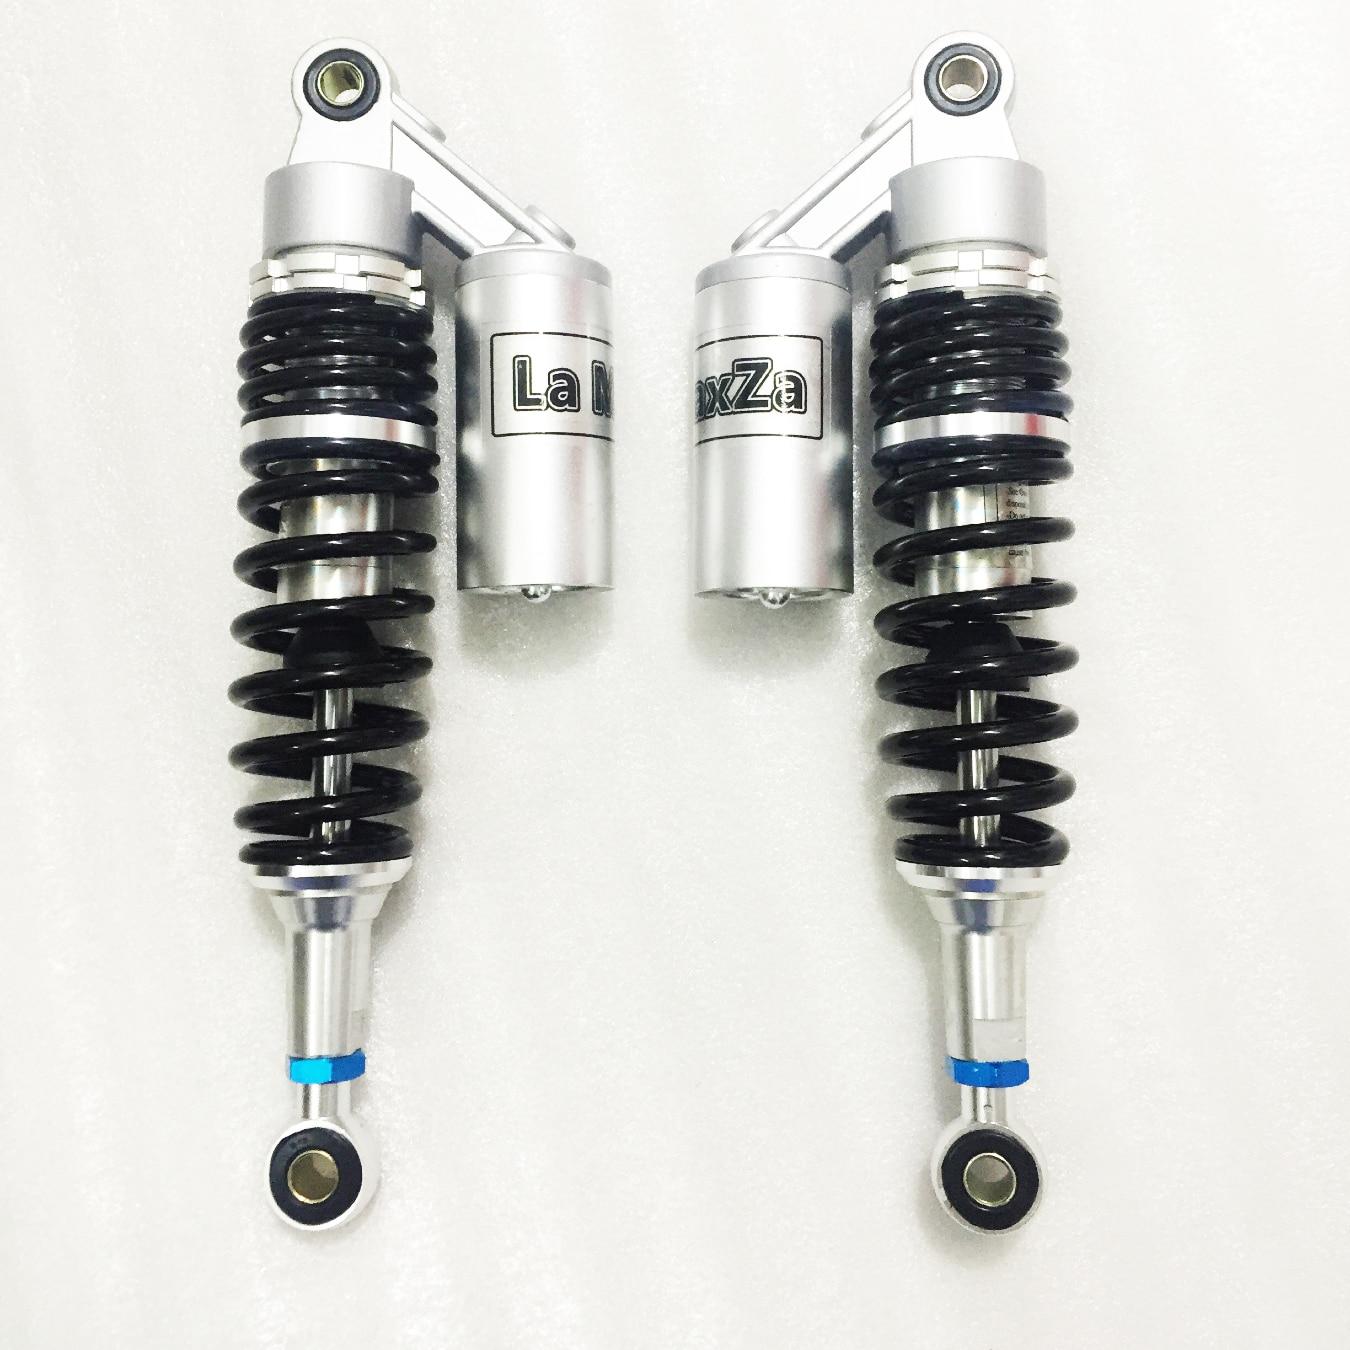 Universal 320mm 330mm Motorcycle Air Shock Absorber Rear Suspension For Honda Yamaha Suzuki Kawasaki Dirt bikes